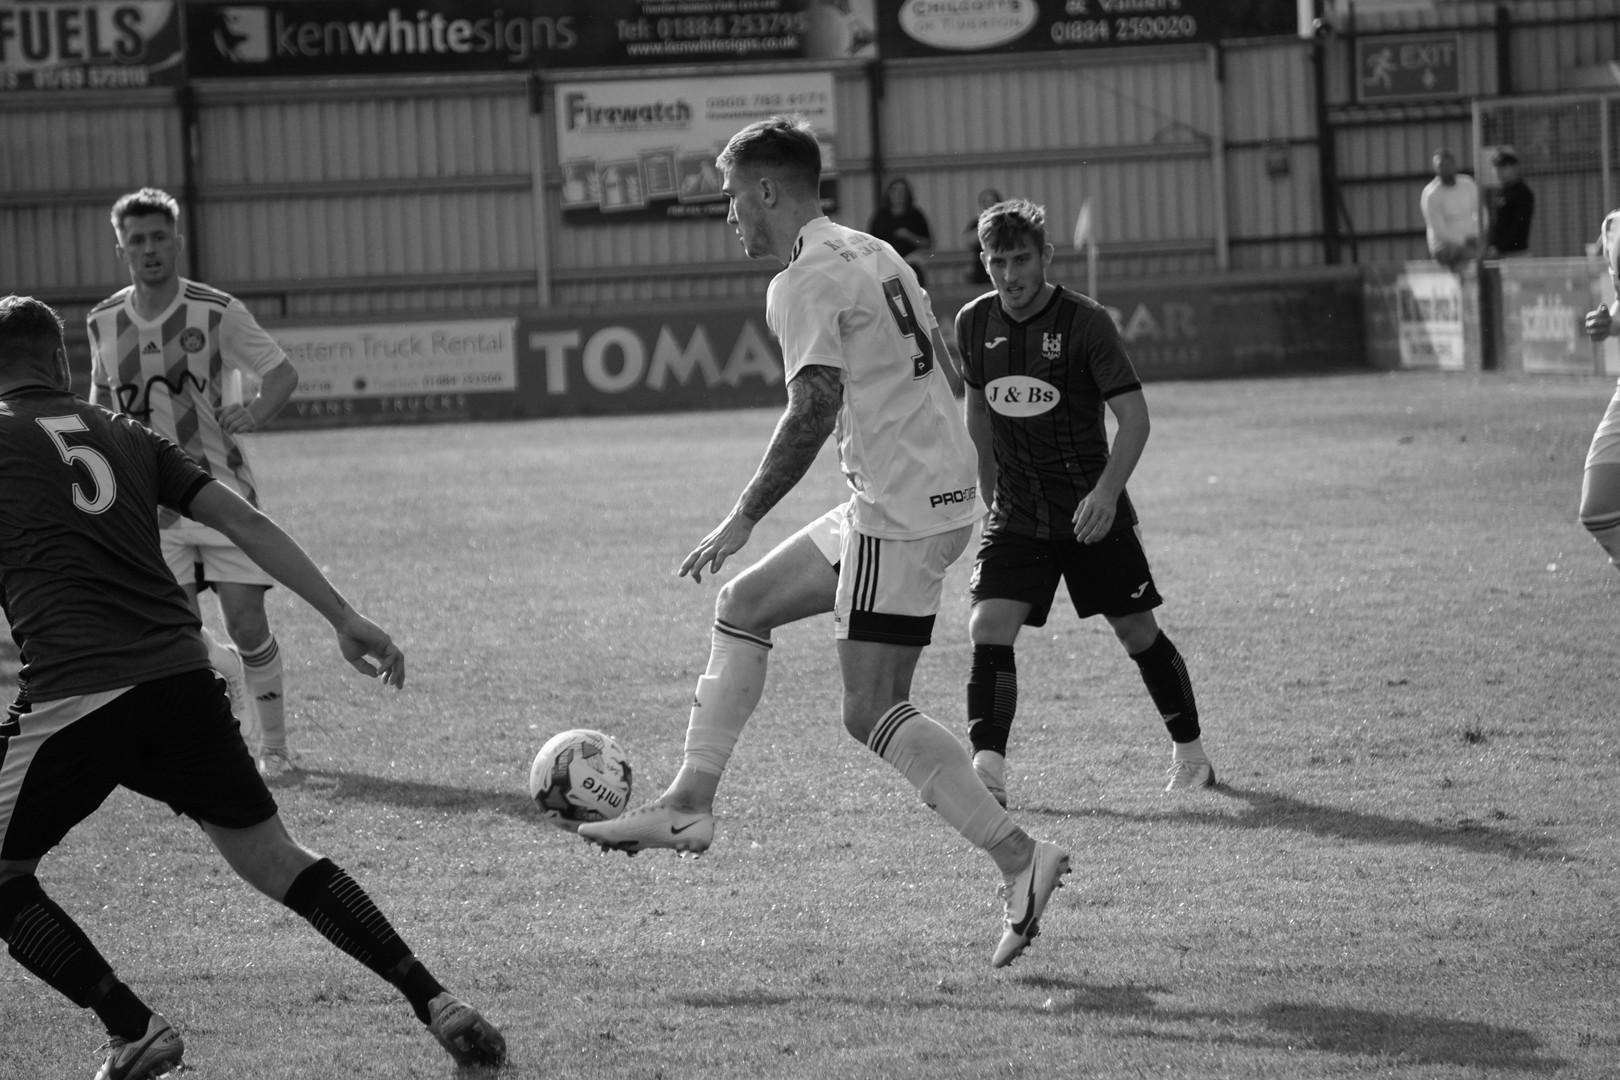 2020-09-19 Tivvy V Wimborne - September